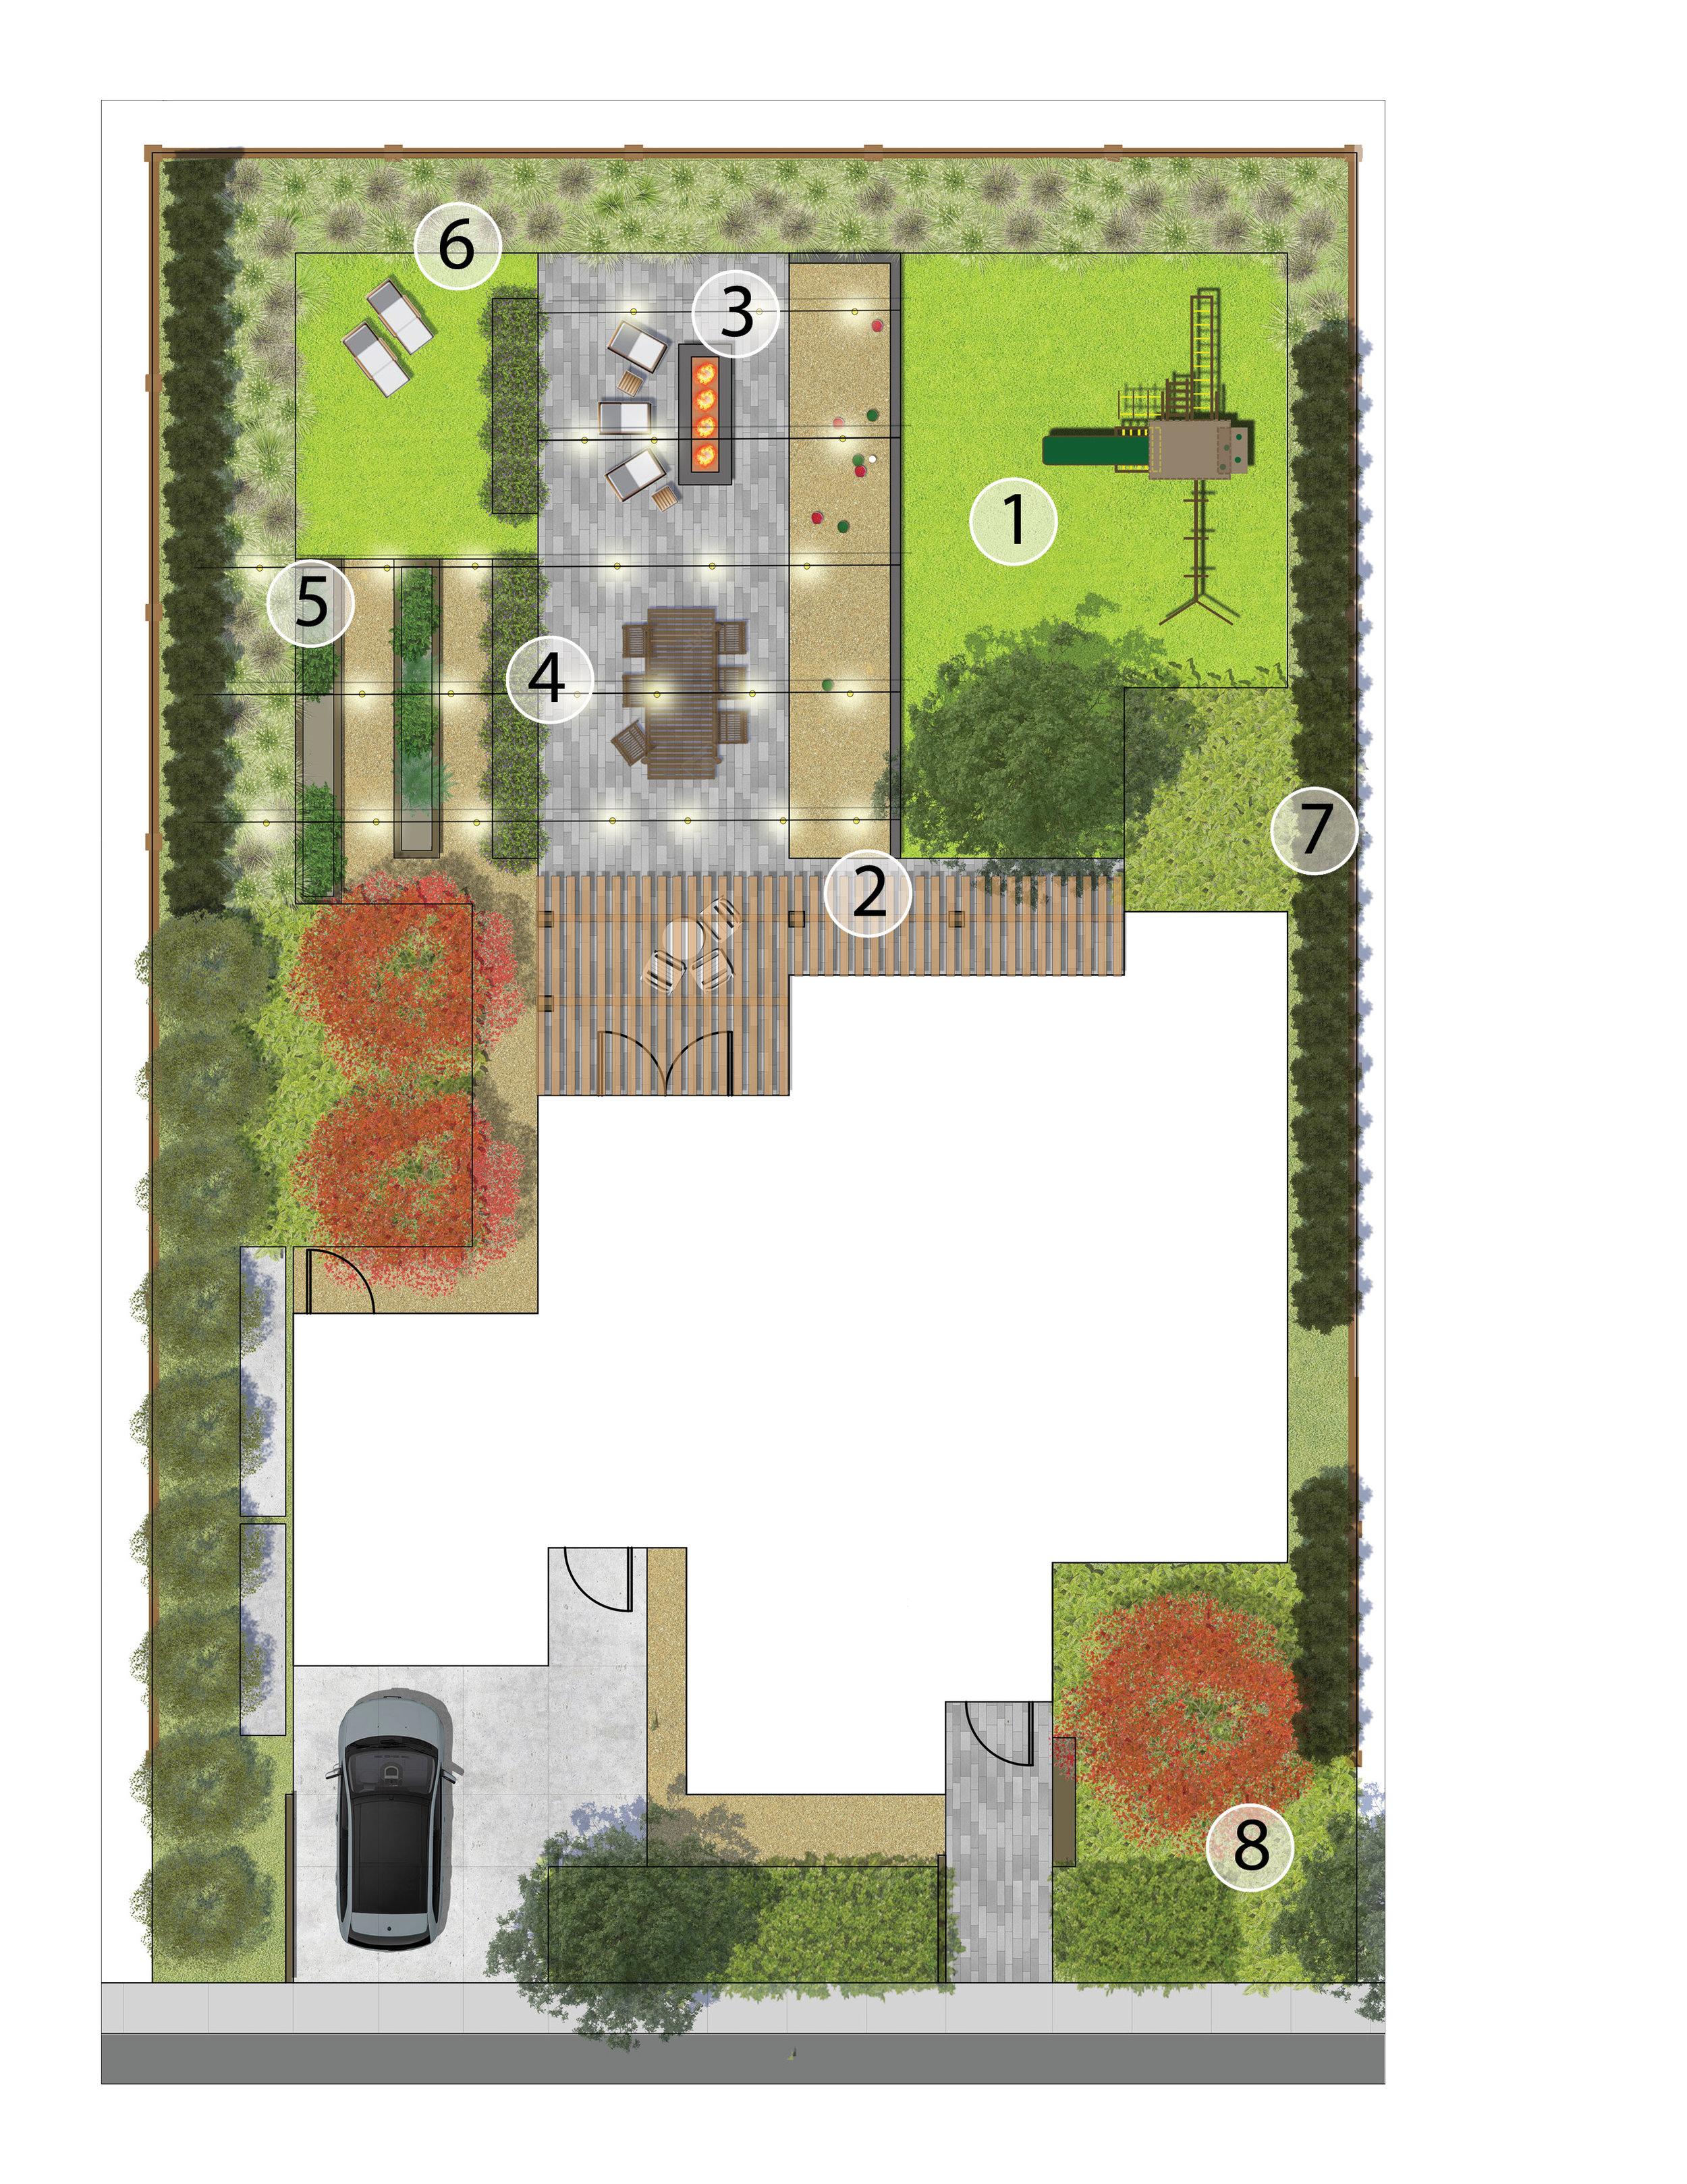 Landscape Design Bocce